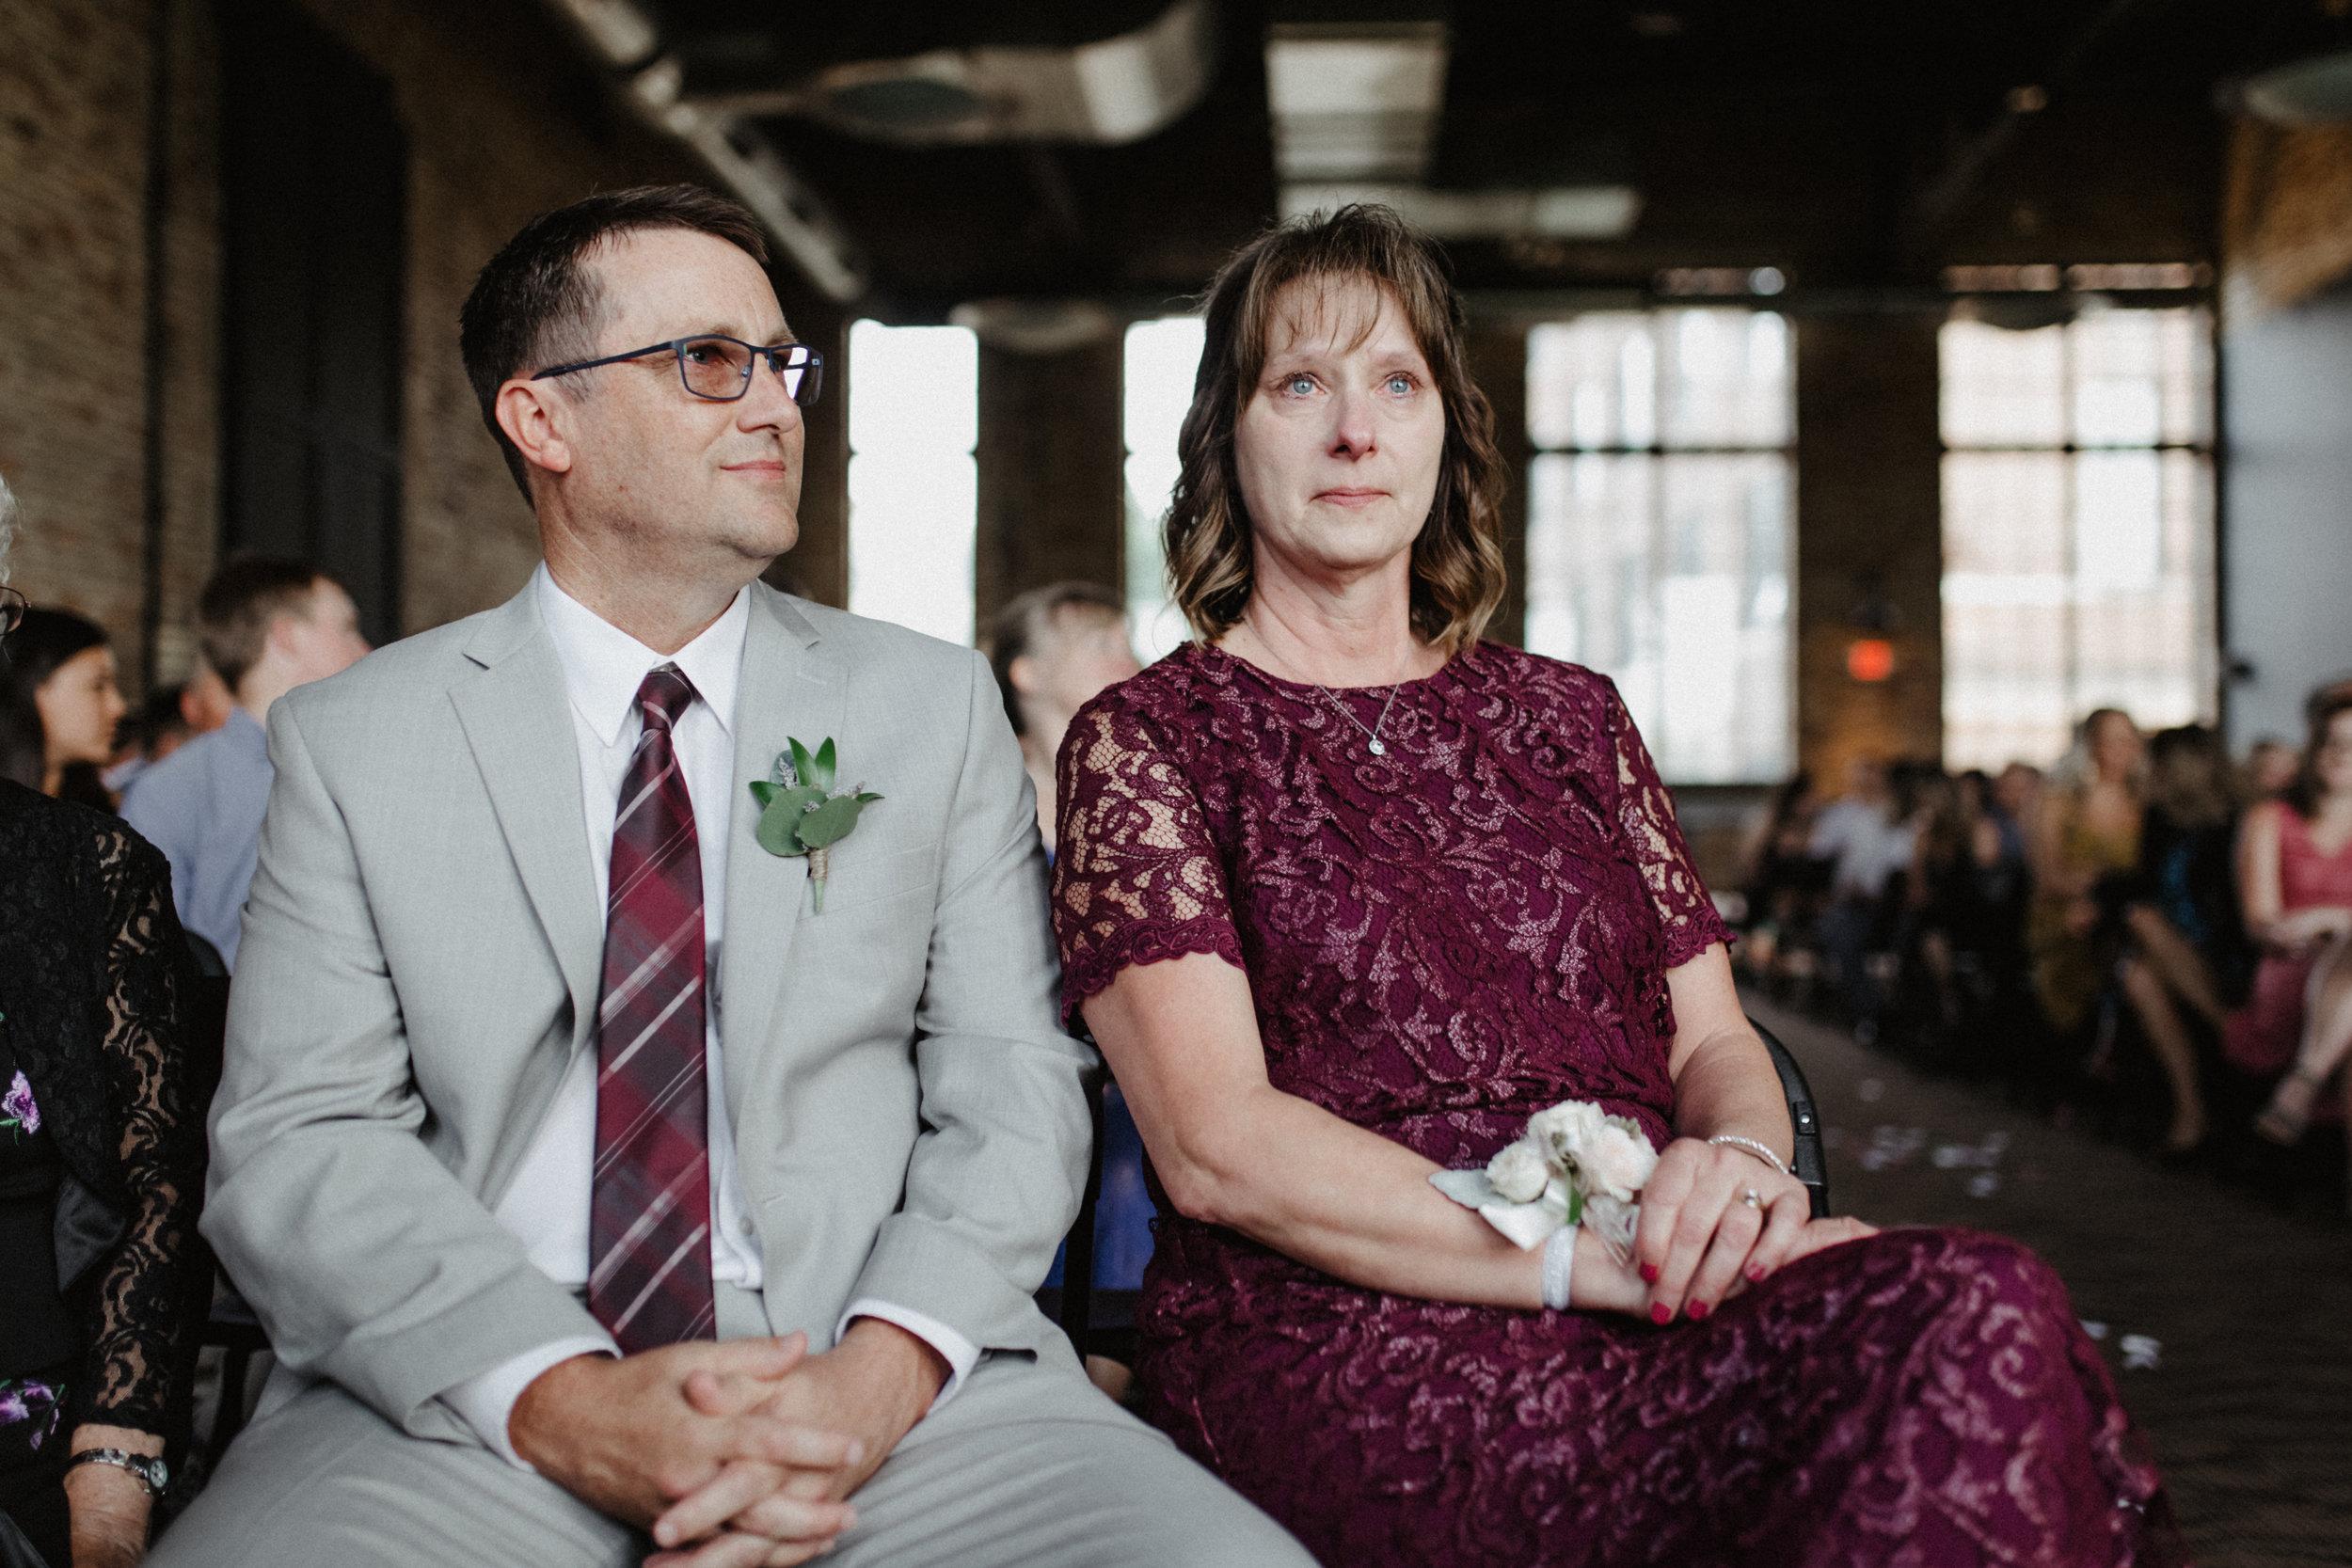 GRAYCENTOMHAMILTON-GRAND-RAPIDS-WEDDING-PHOTOGRAPHY-46.jpg